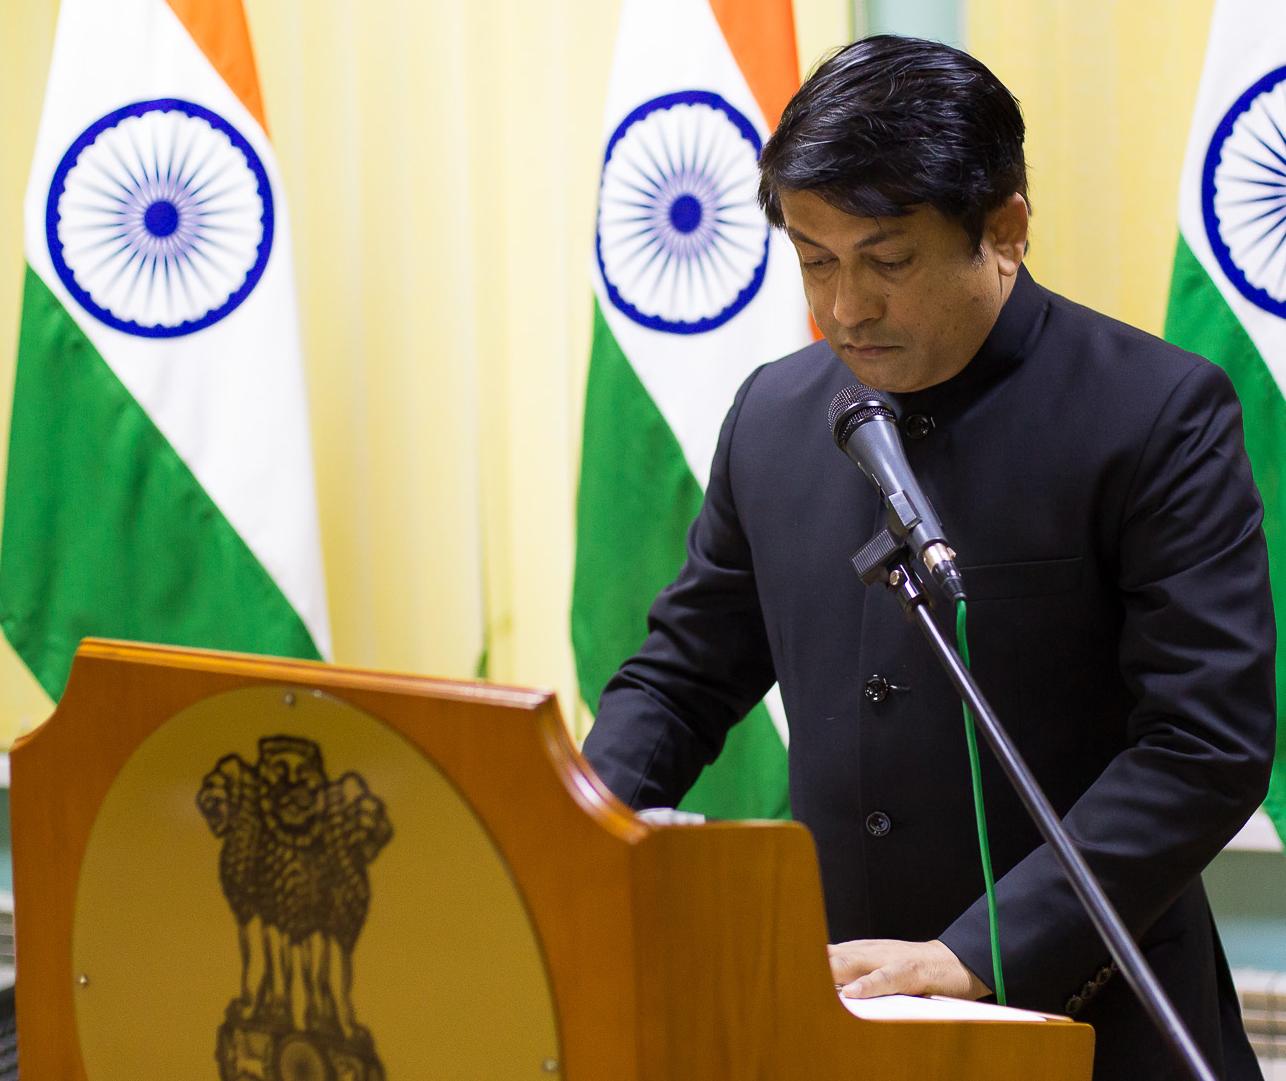 Ambassador Alok Ranjan Jha celebrates Indian independence day in Minsk